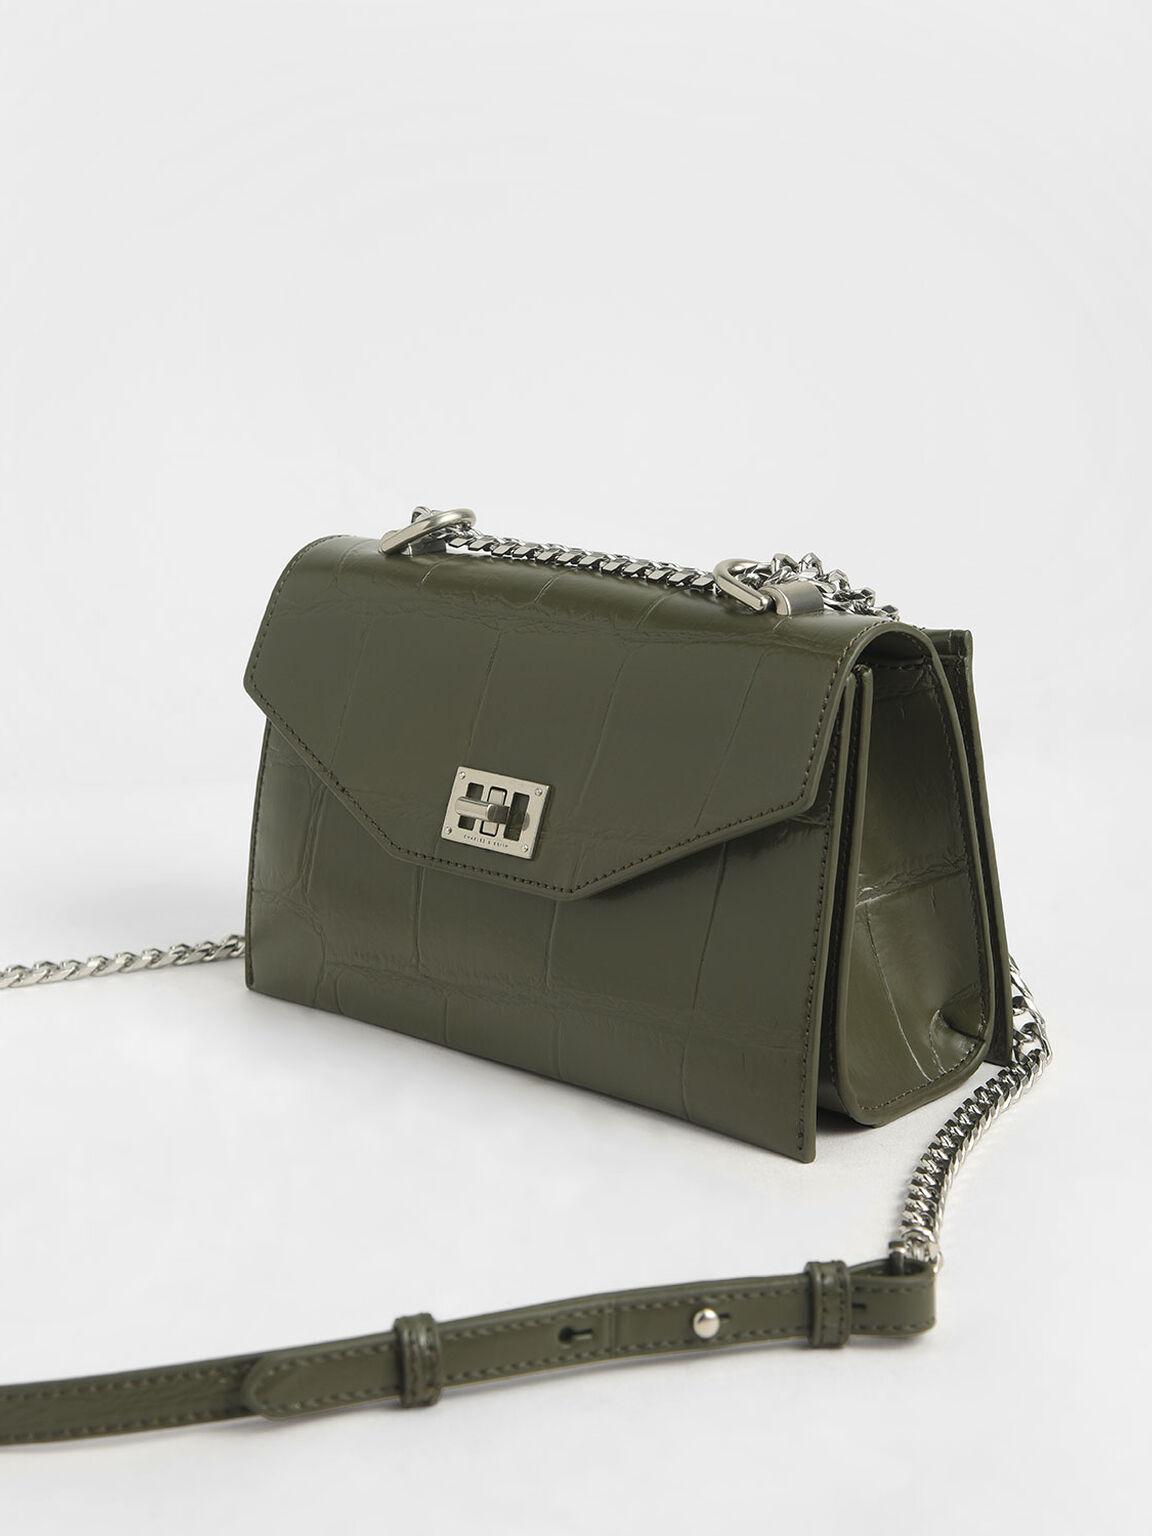 Croc-Effect Turn-Lock Crossbody Bag, Olive, hi-res